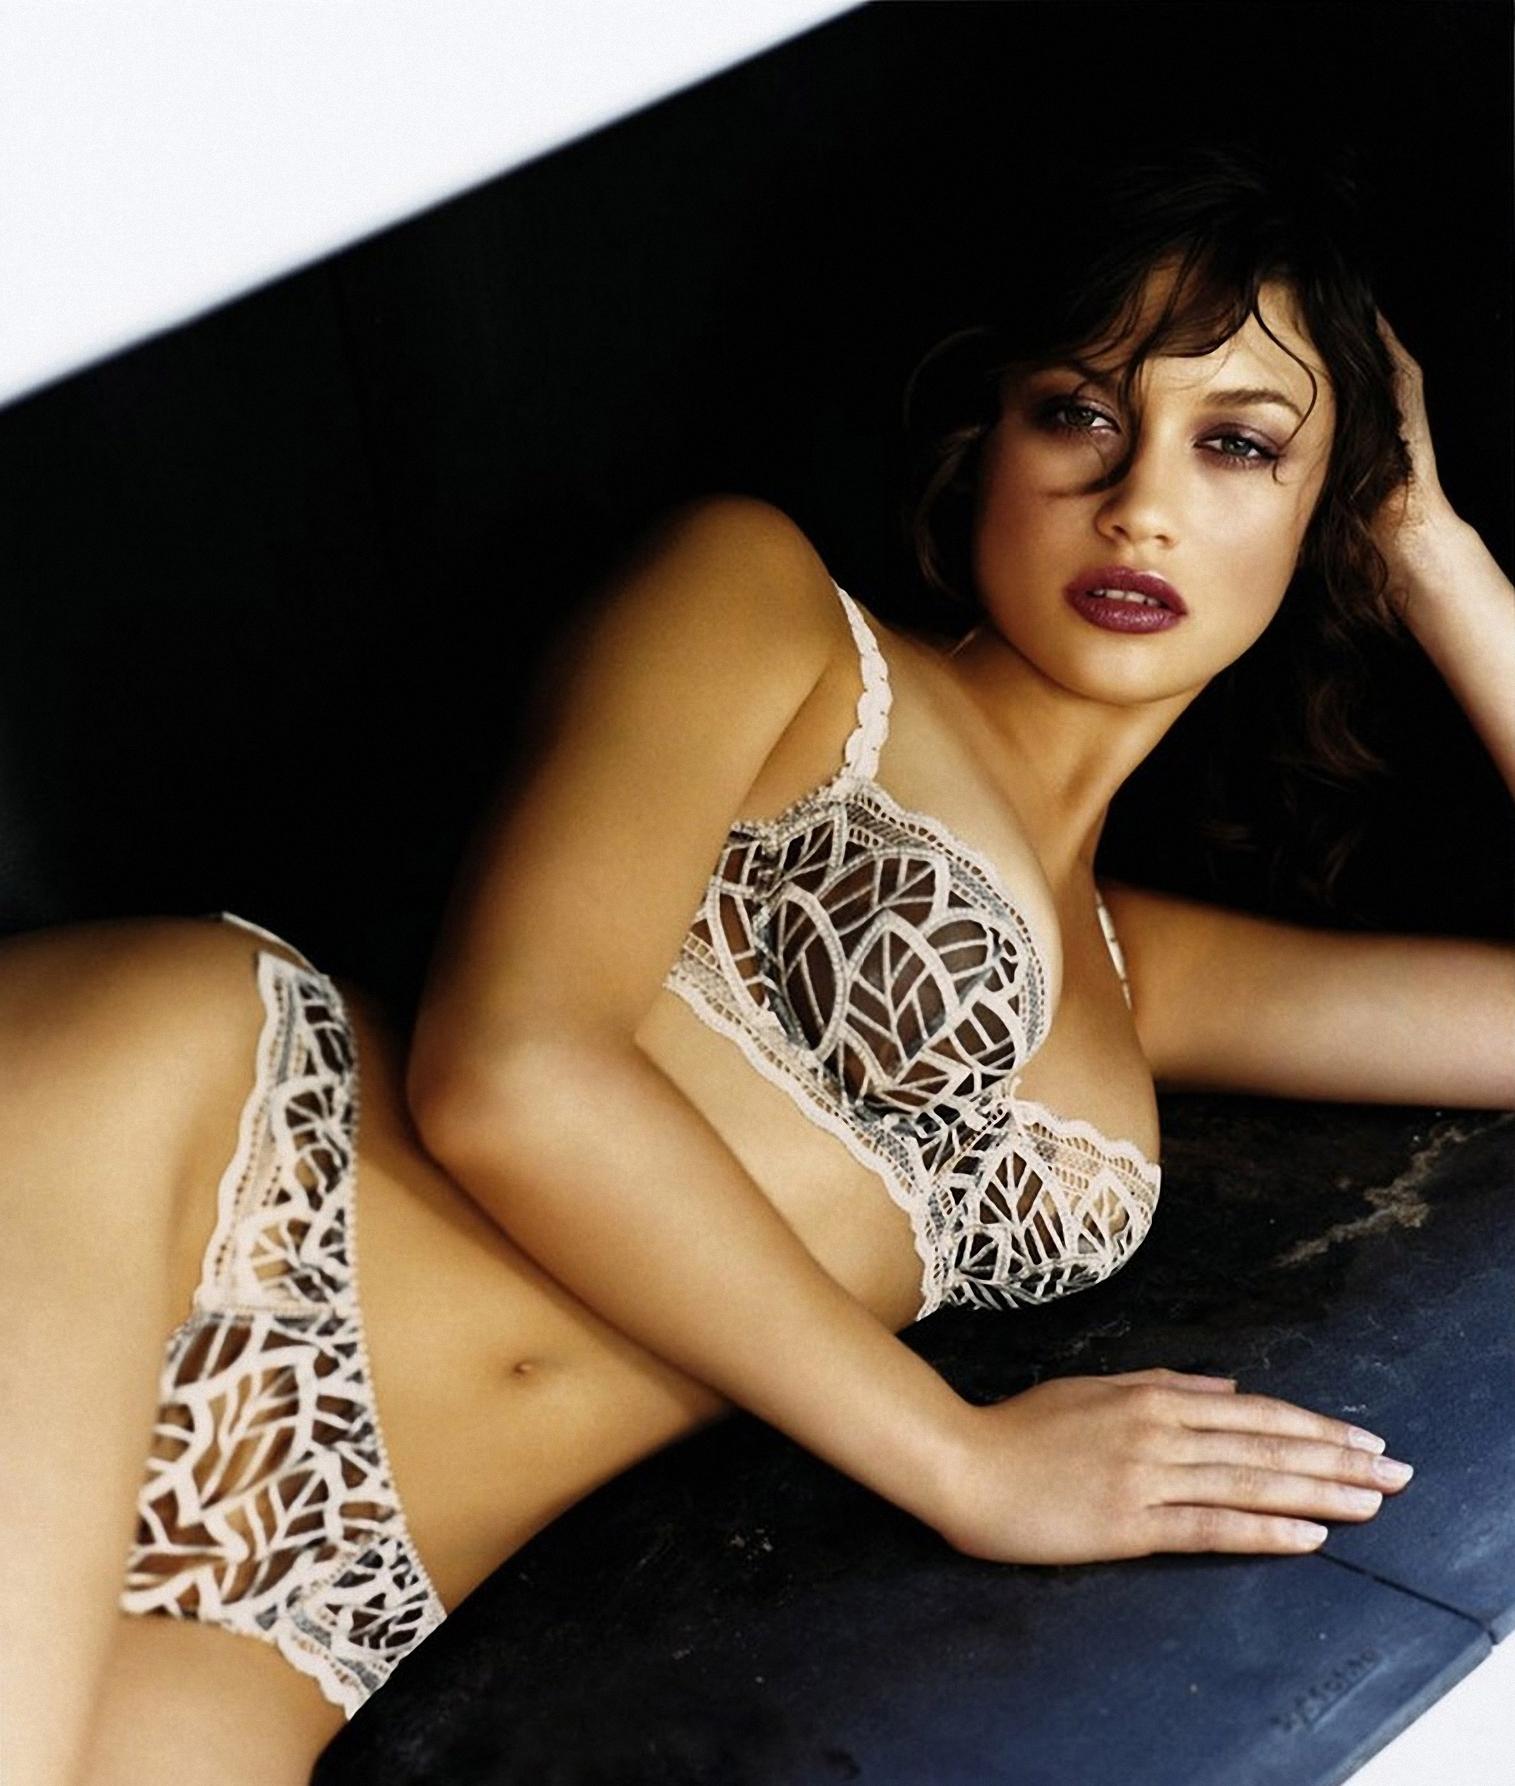 ukraina-modeli-foto-porno